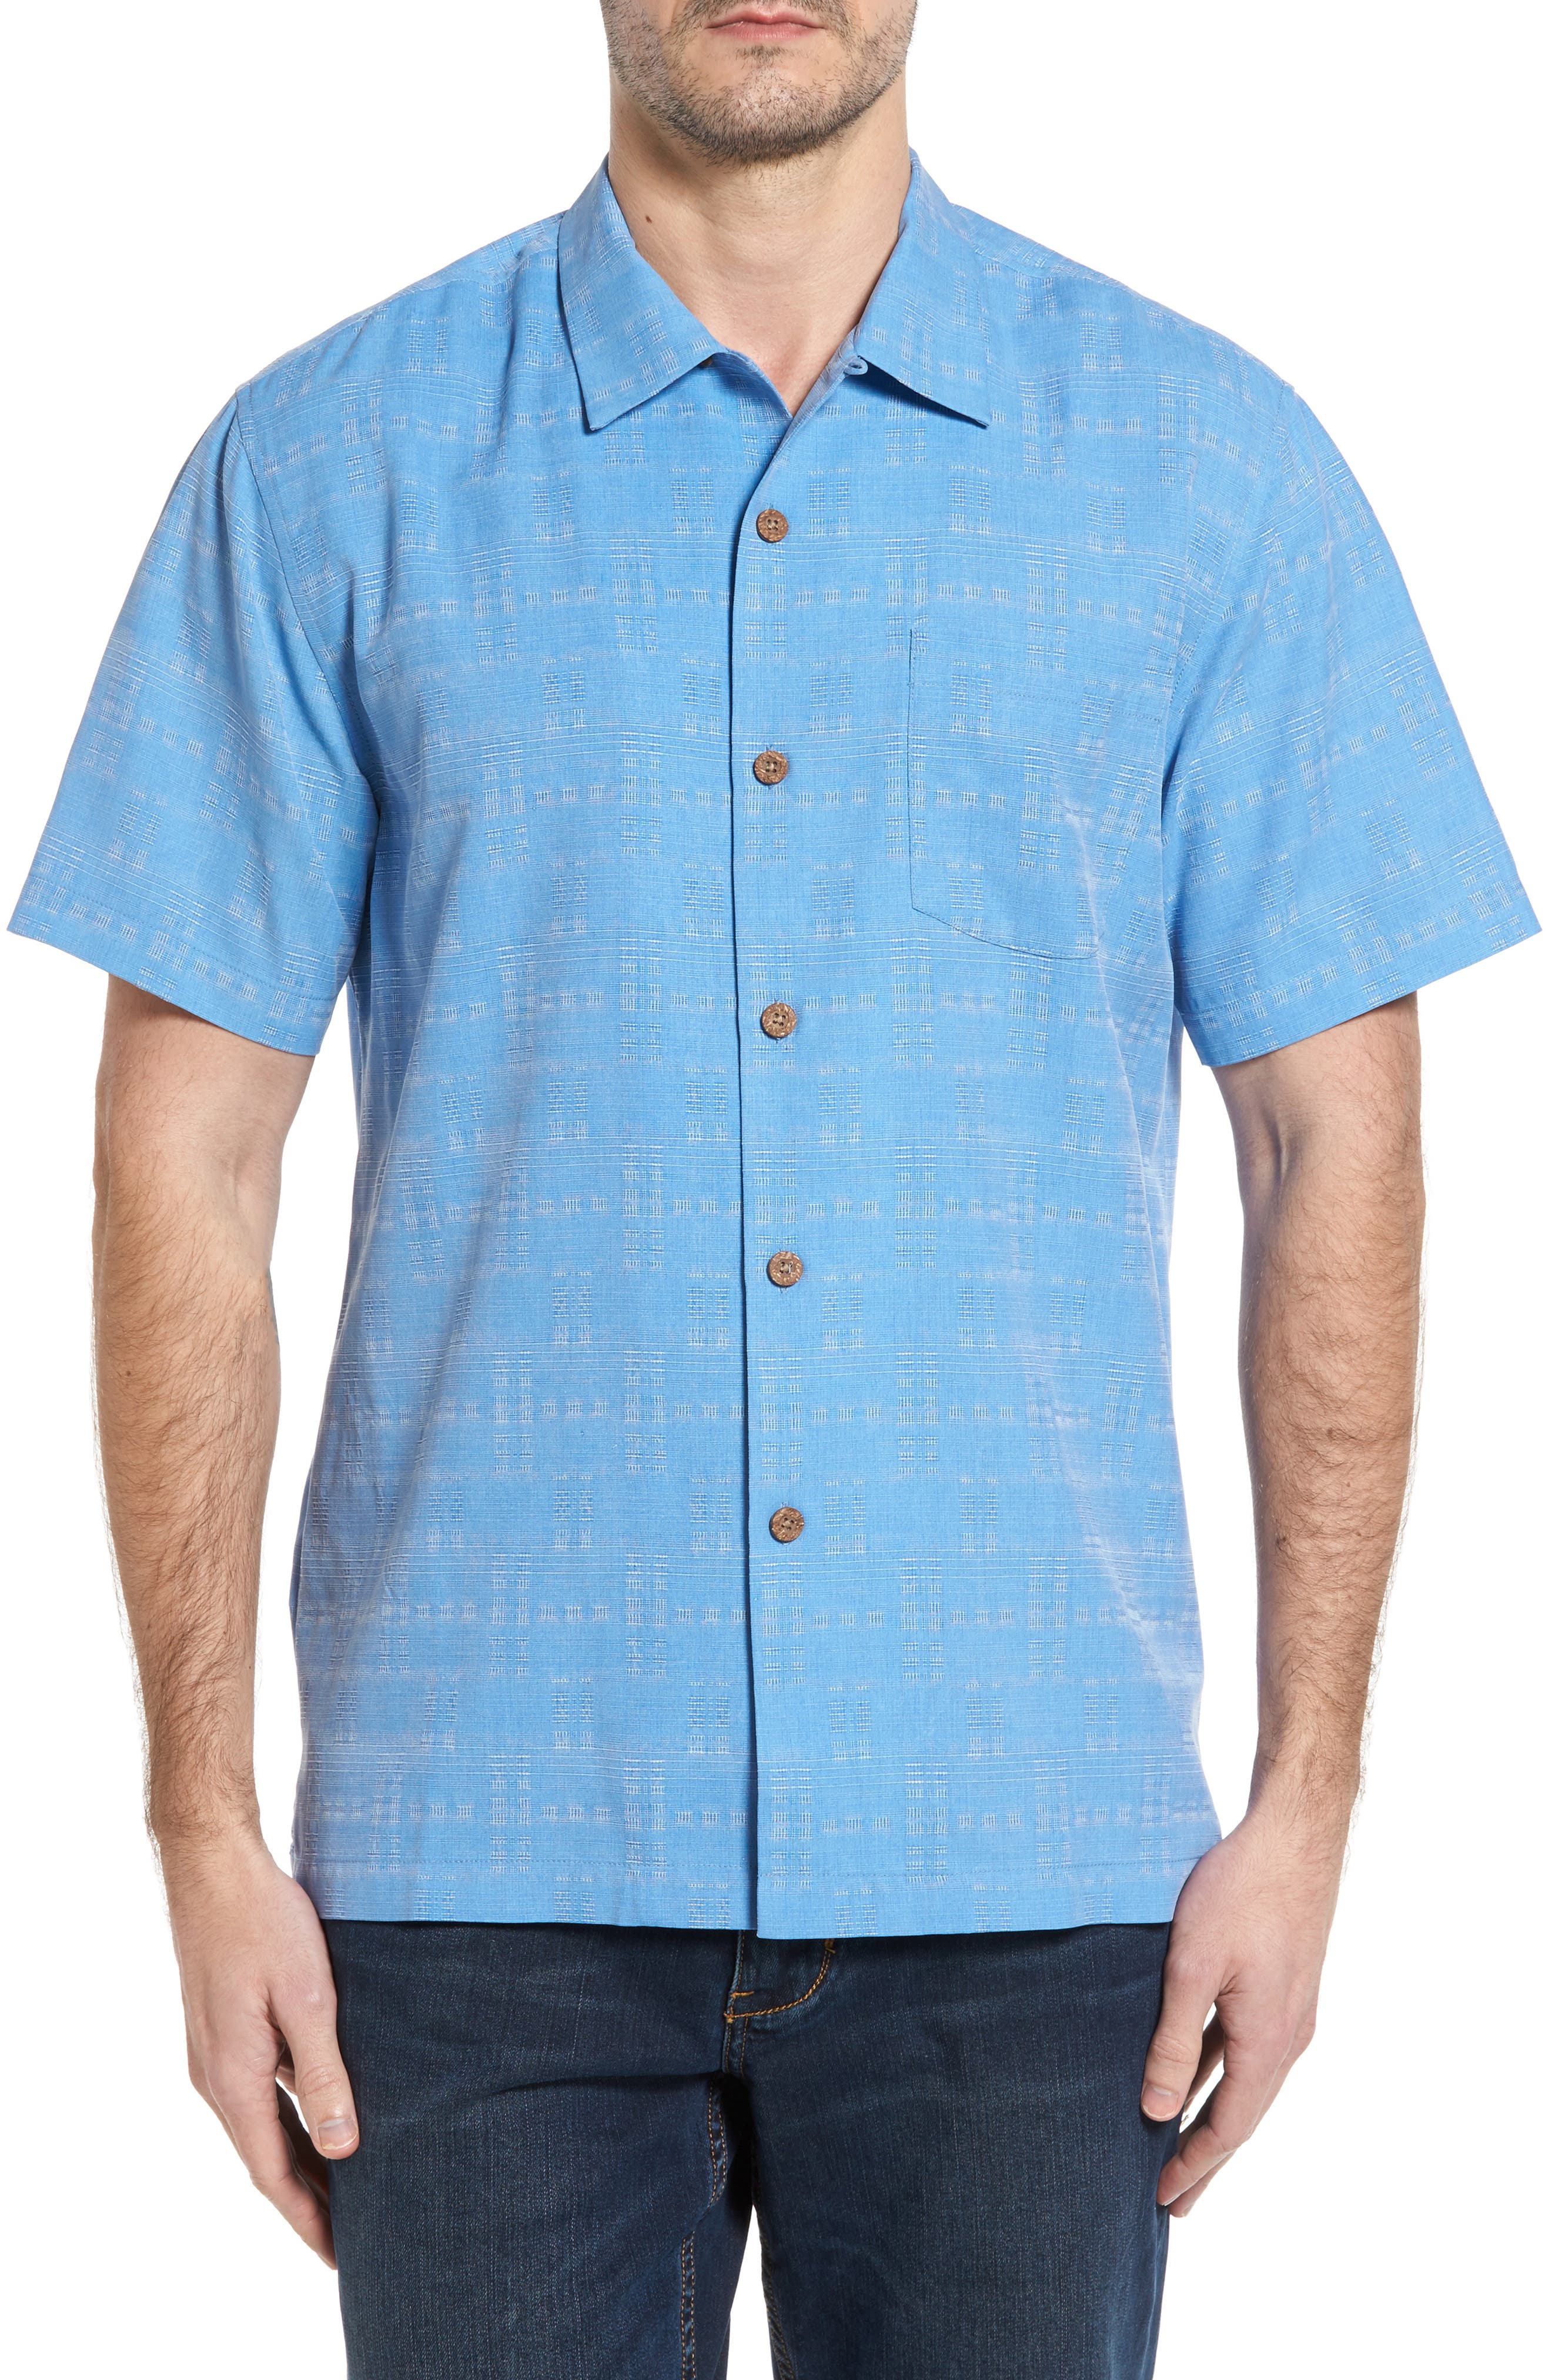 Tommy Bahama Original Fit Jacquard Silk Camp Shirt